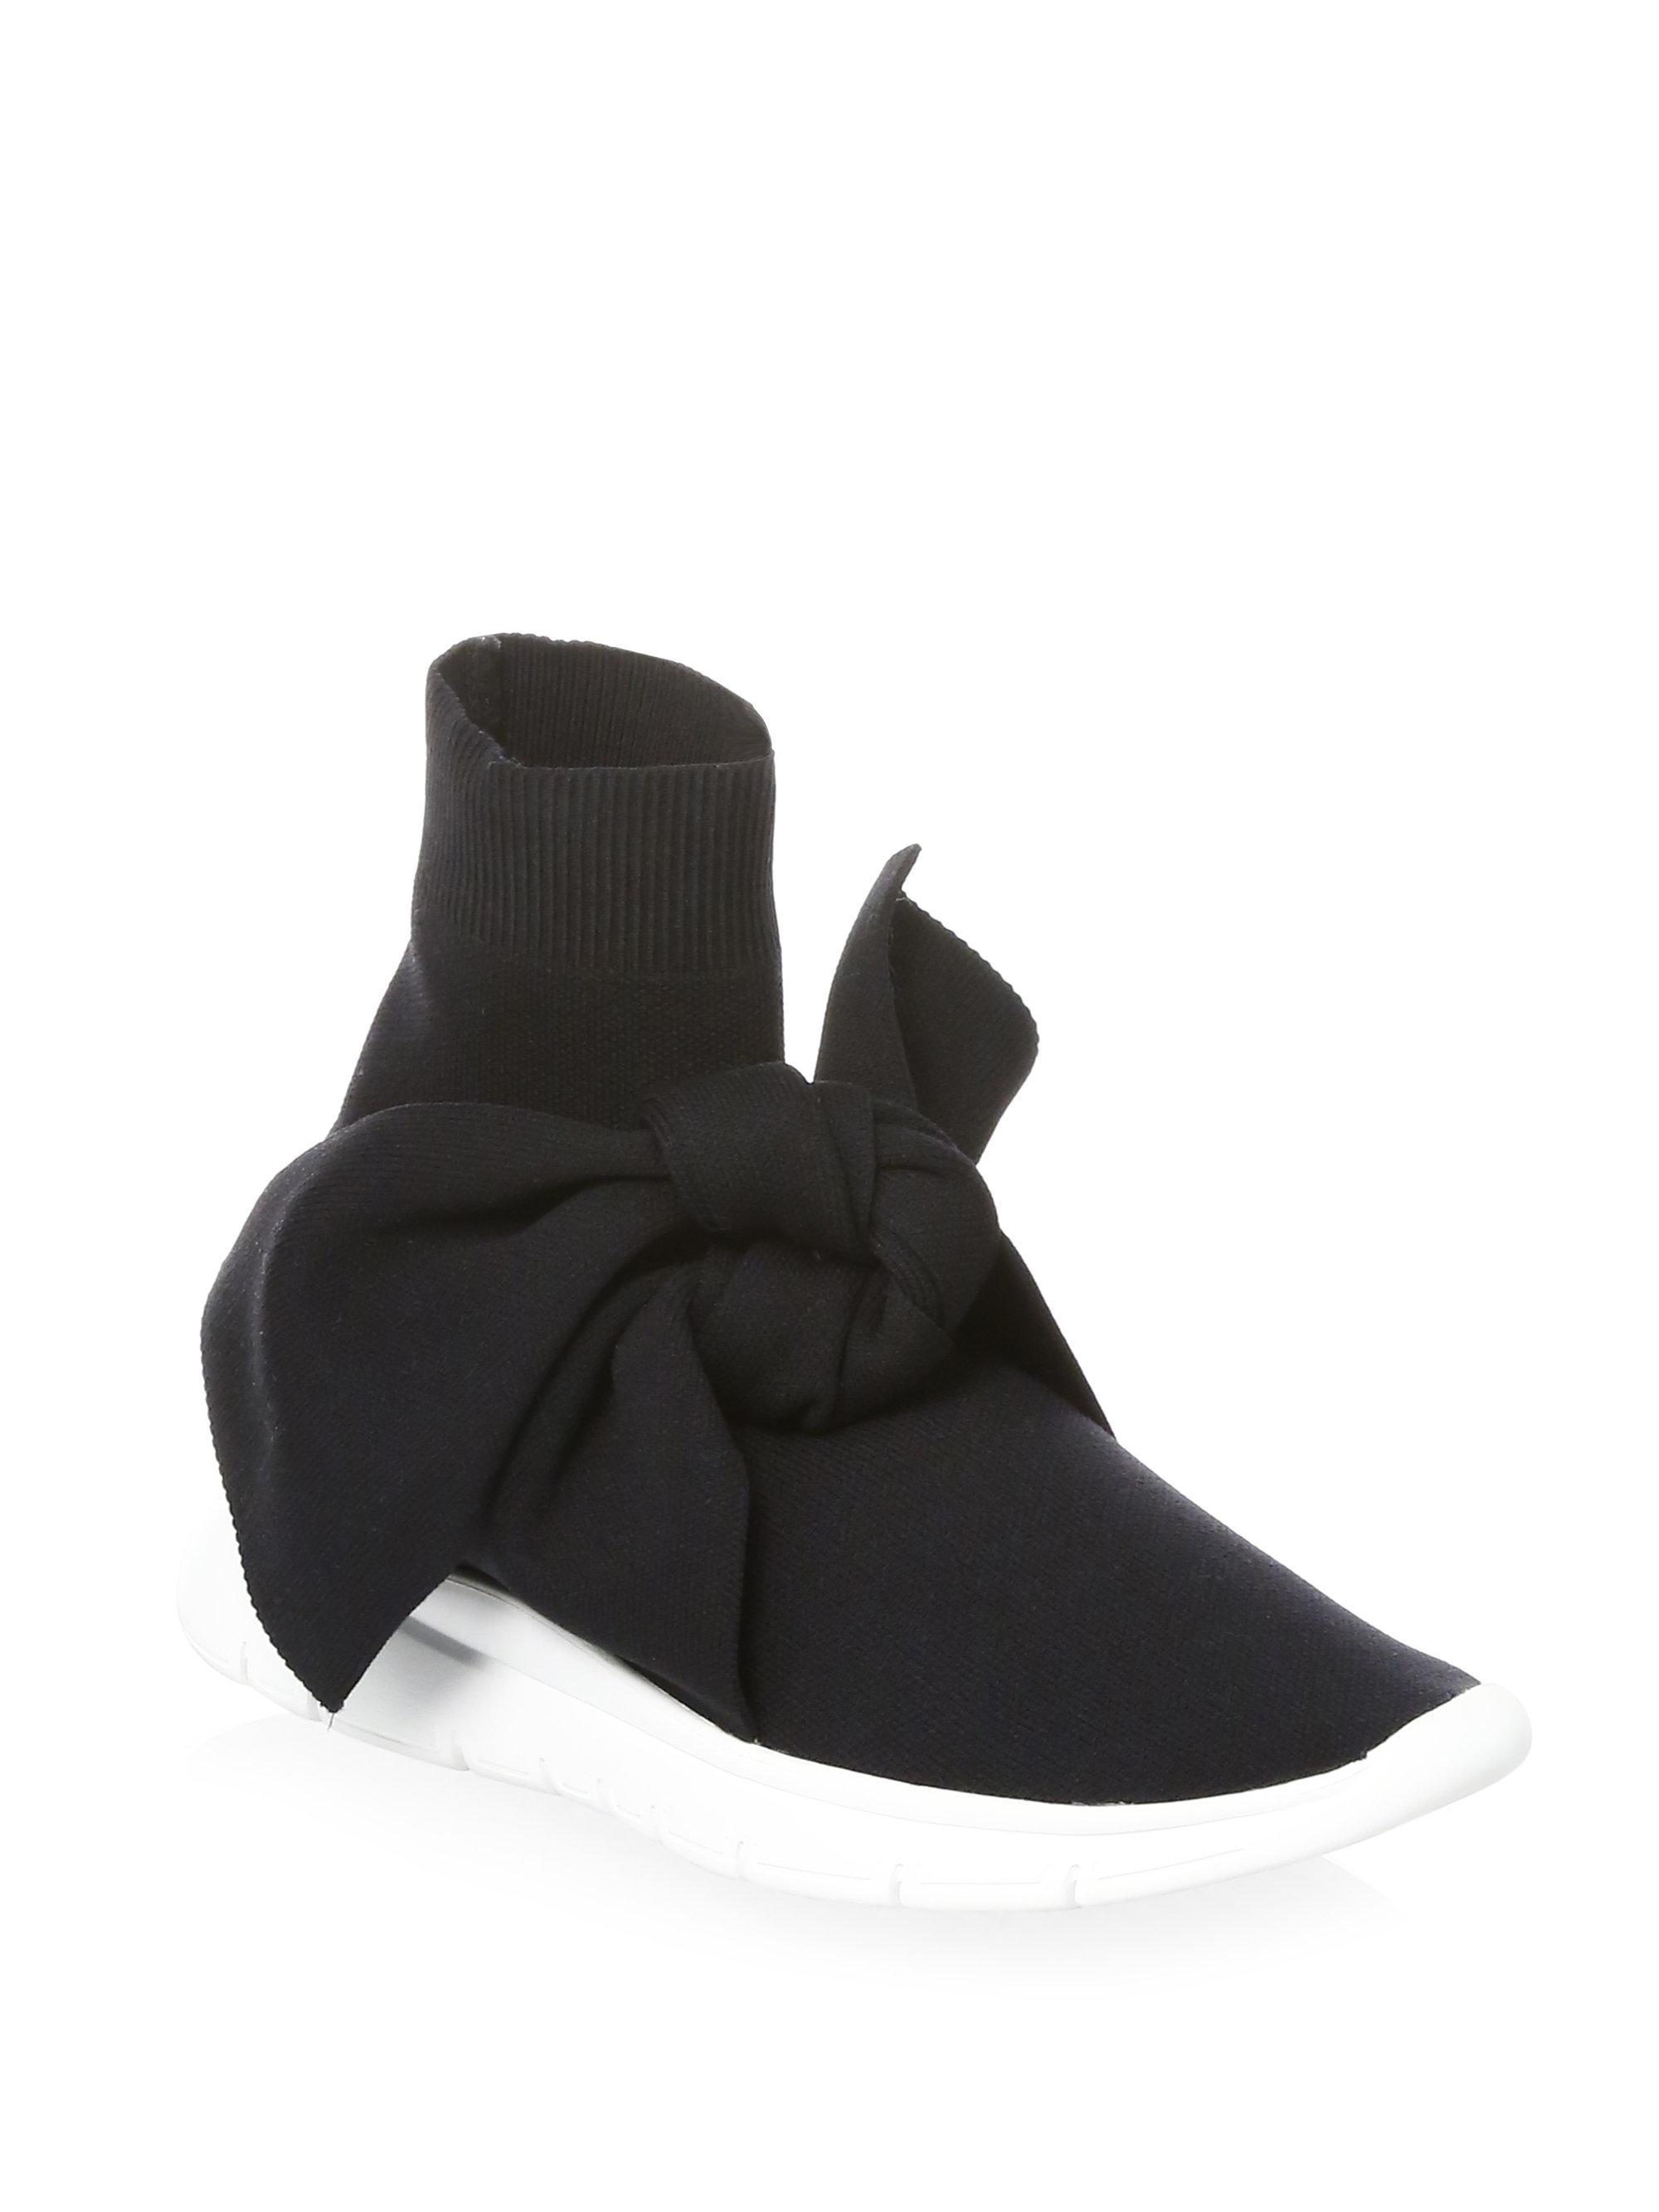 Sock Knot Sneakers Joshua Sanders gAq8bXRW